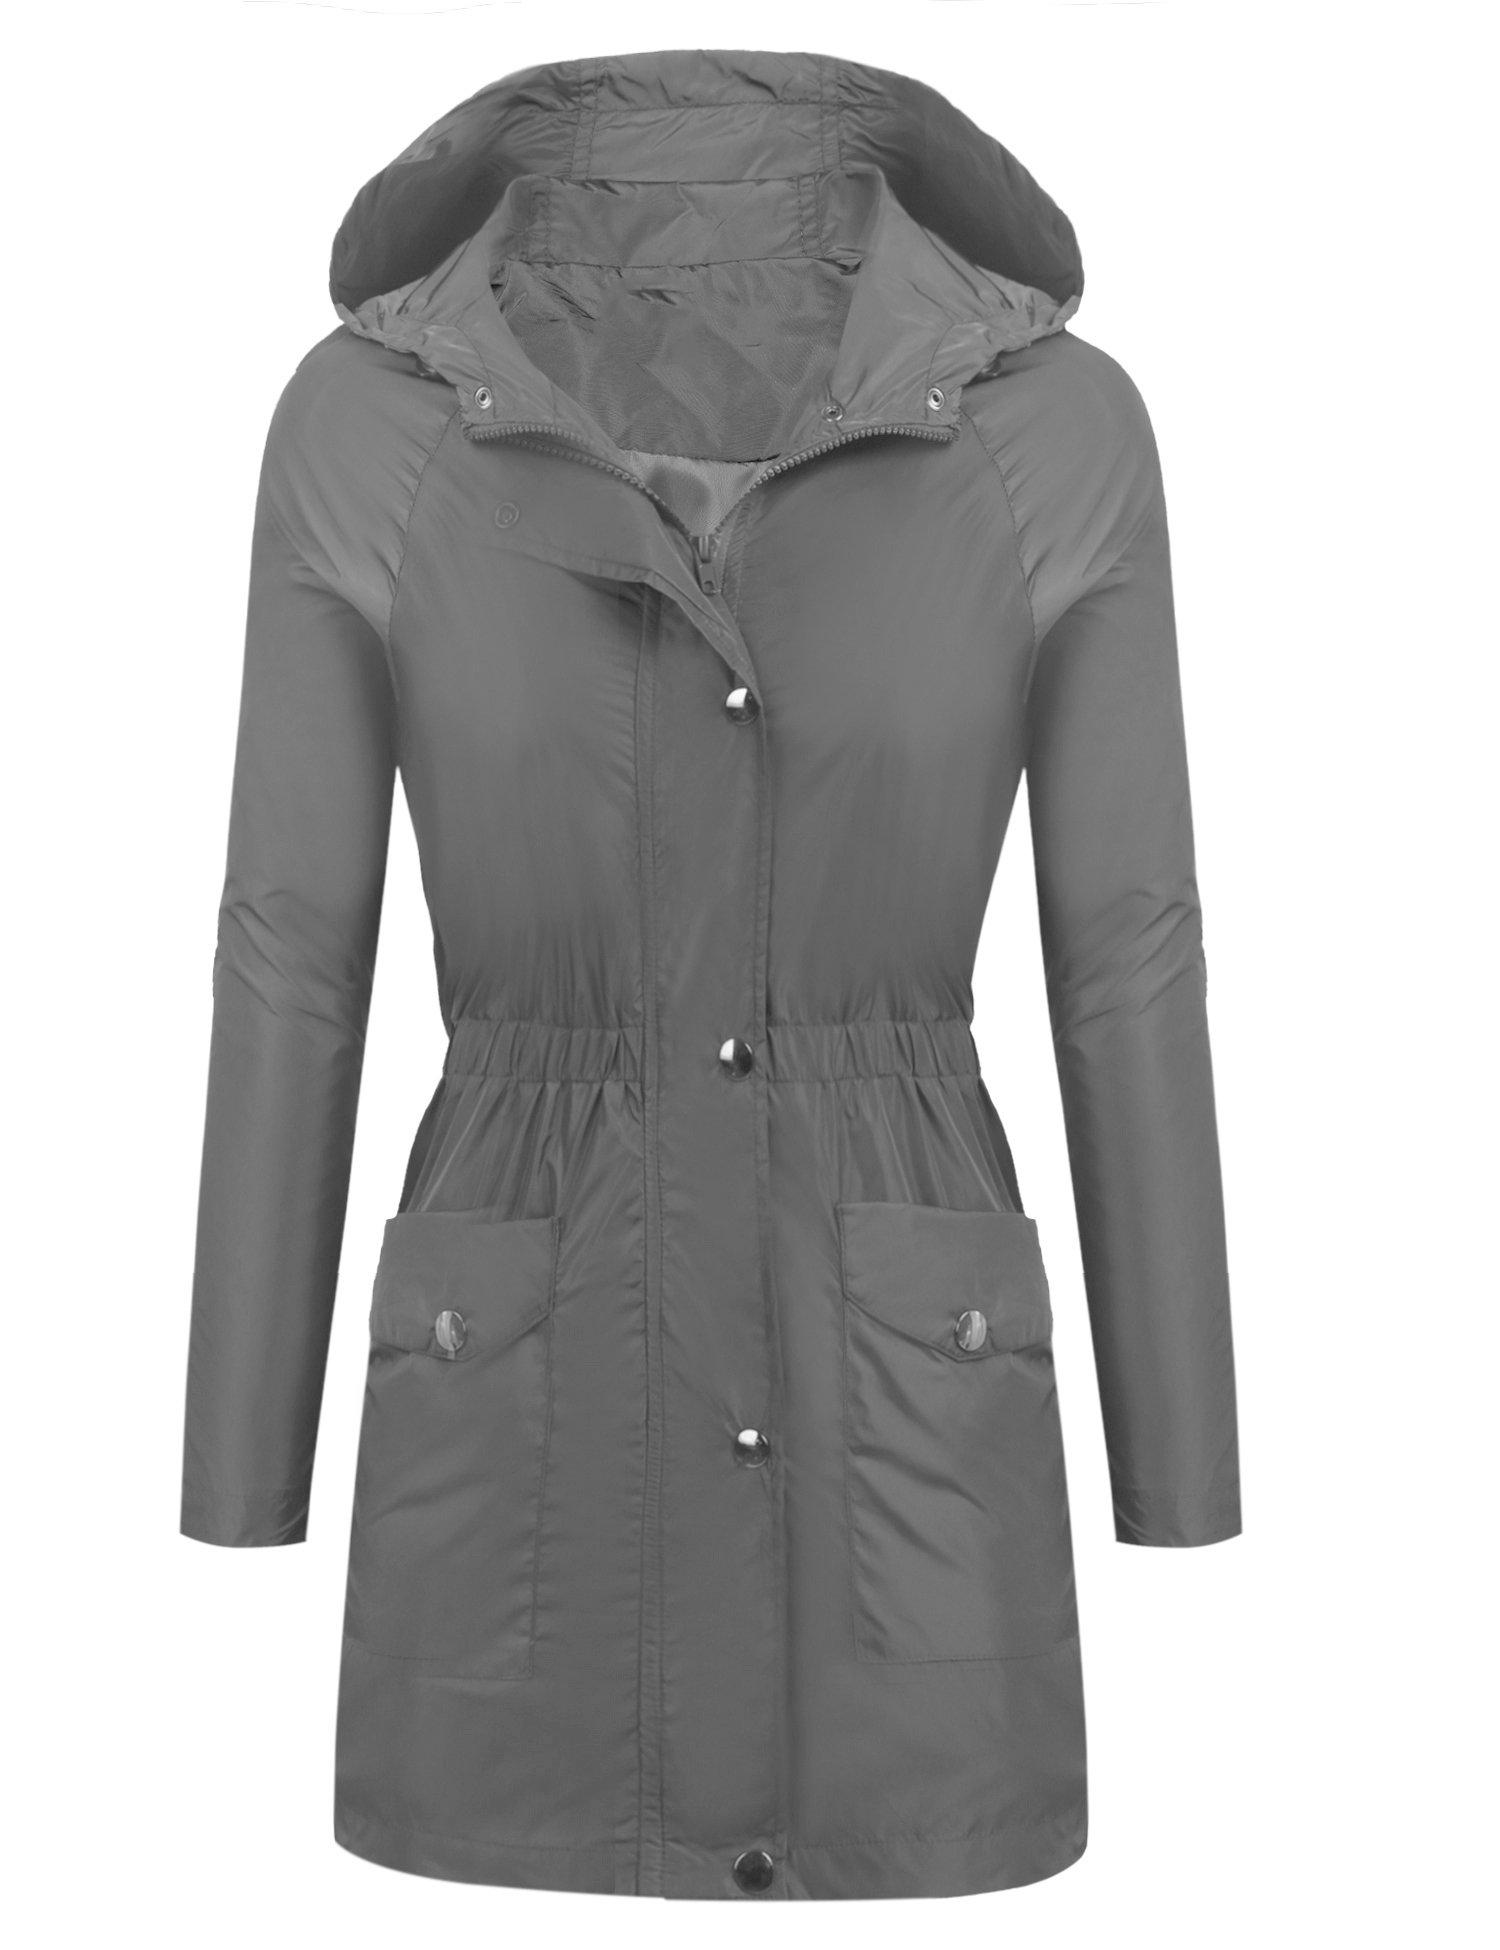 Beyove Womens Long Sleeve Lightweight Waterproof Outdoor Raincoat with Hooded Grey XXL